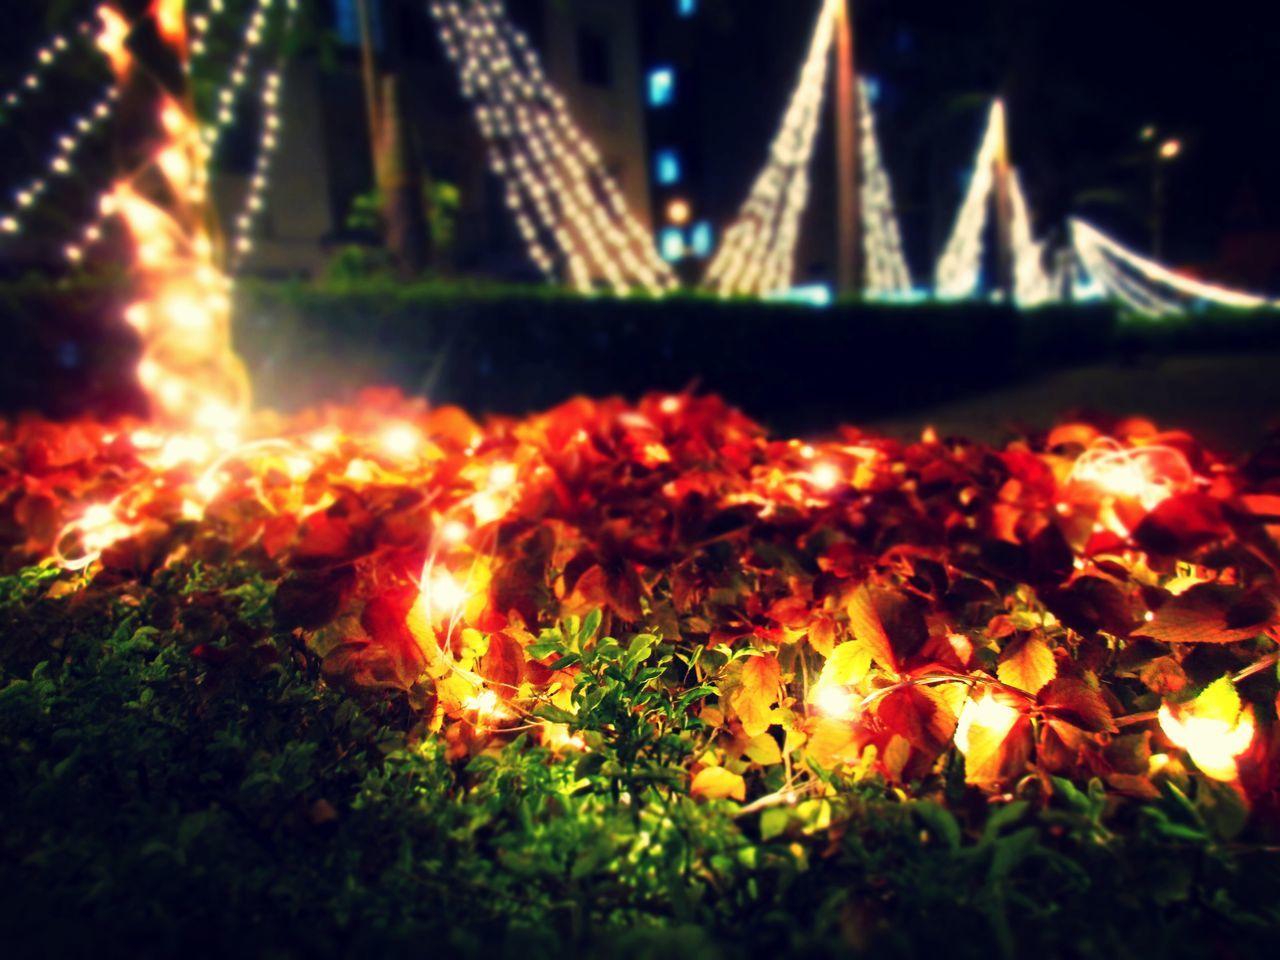 DIwali lights! Spread a smile by sharing love and happiness :) Bush Bushes Diwali Diwali2014 Glowing Lights Night Night Photography Night View Nightlife Nightout Nightphotography Nightshot Tree First Eyeem Photo